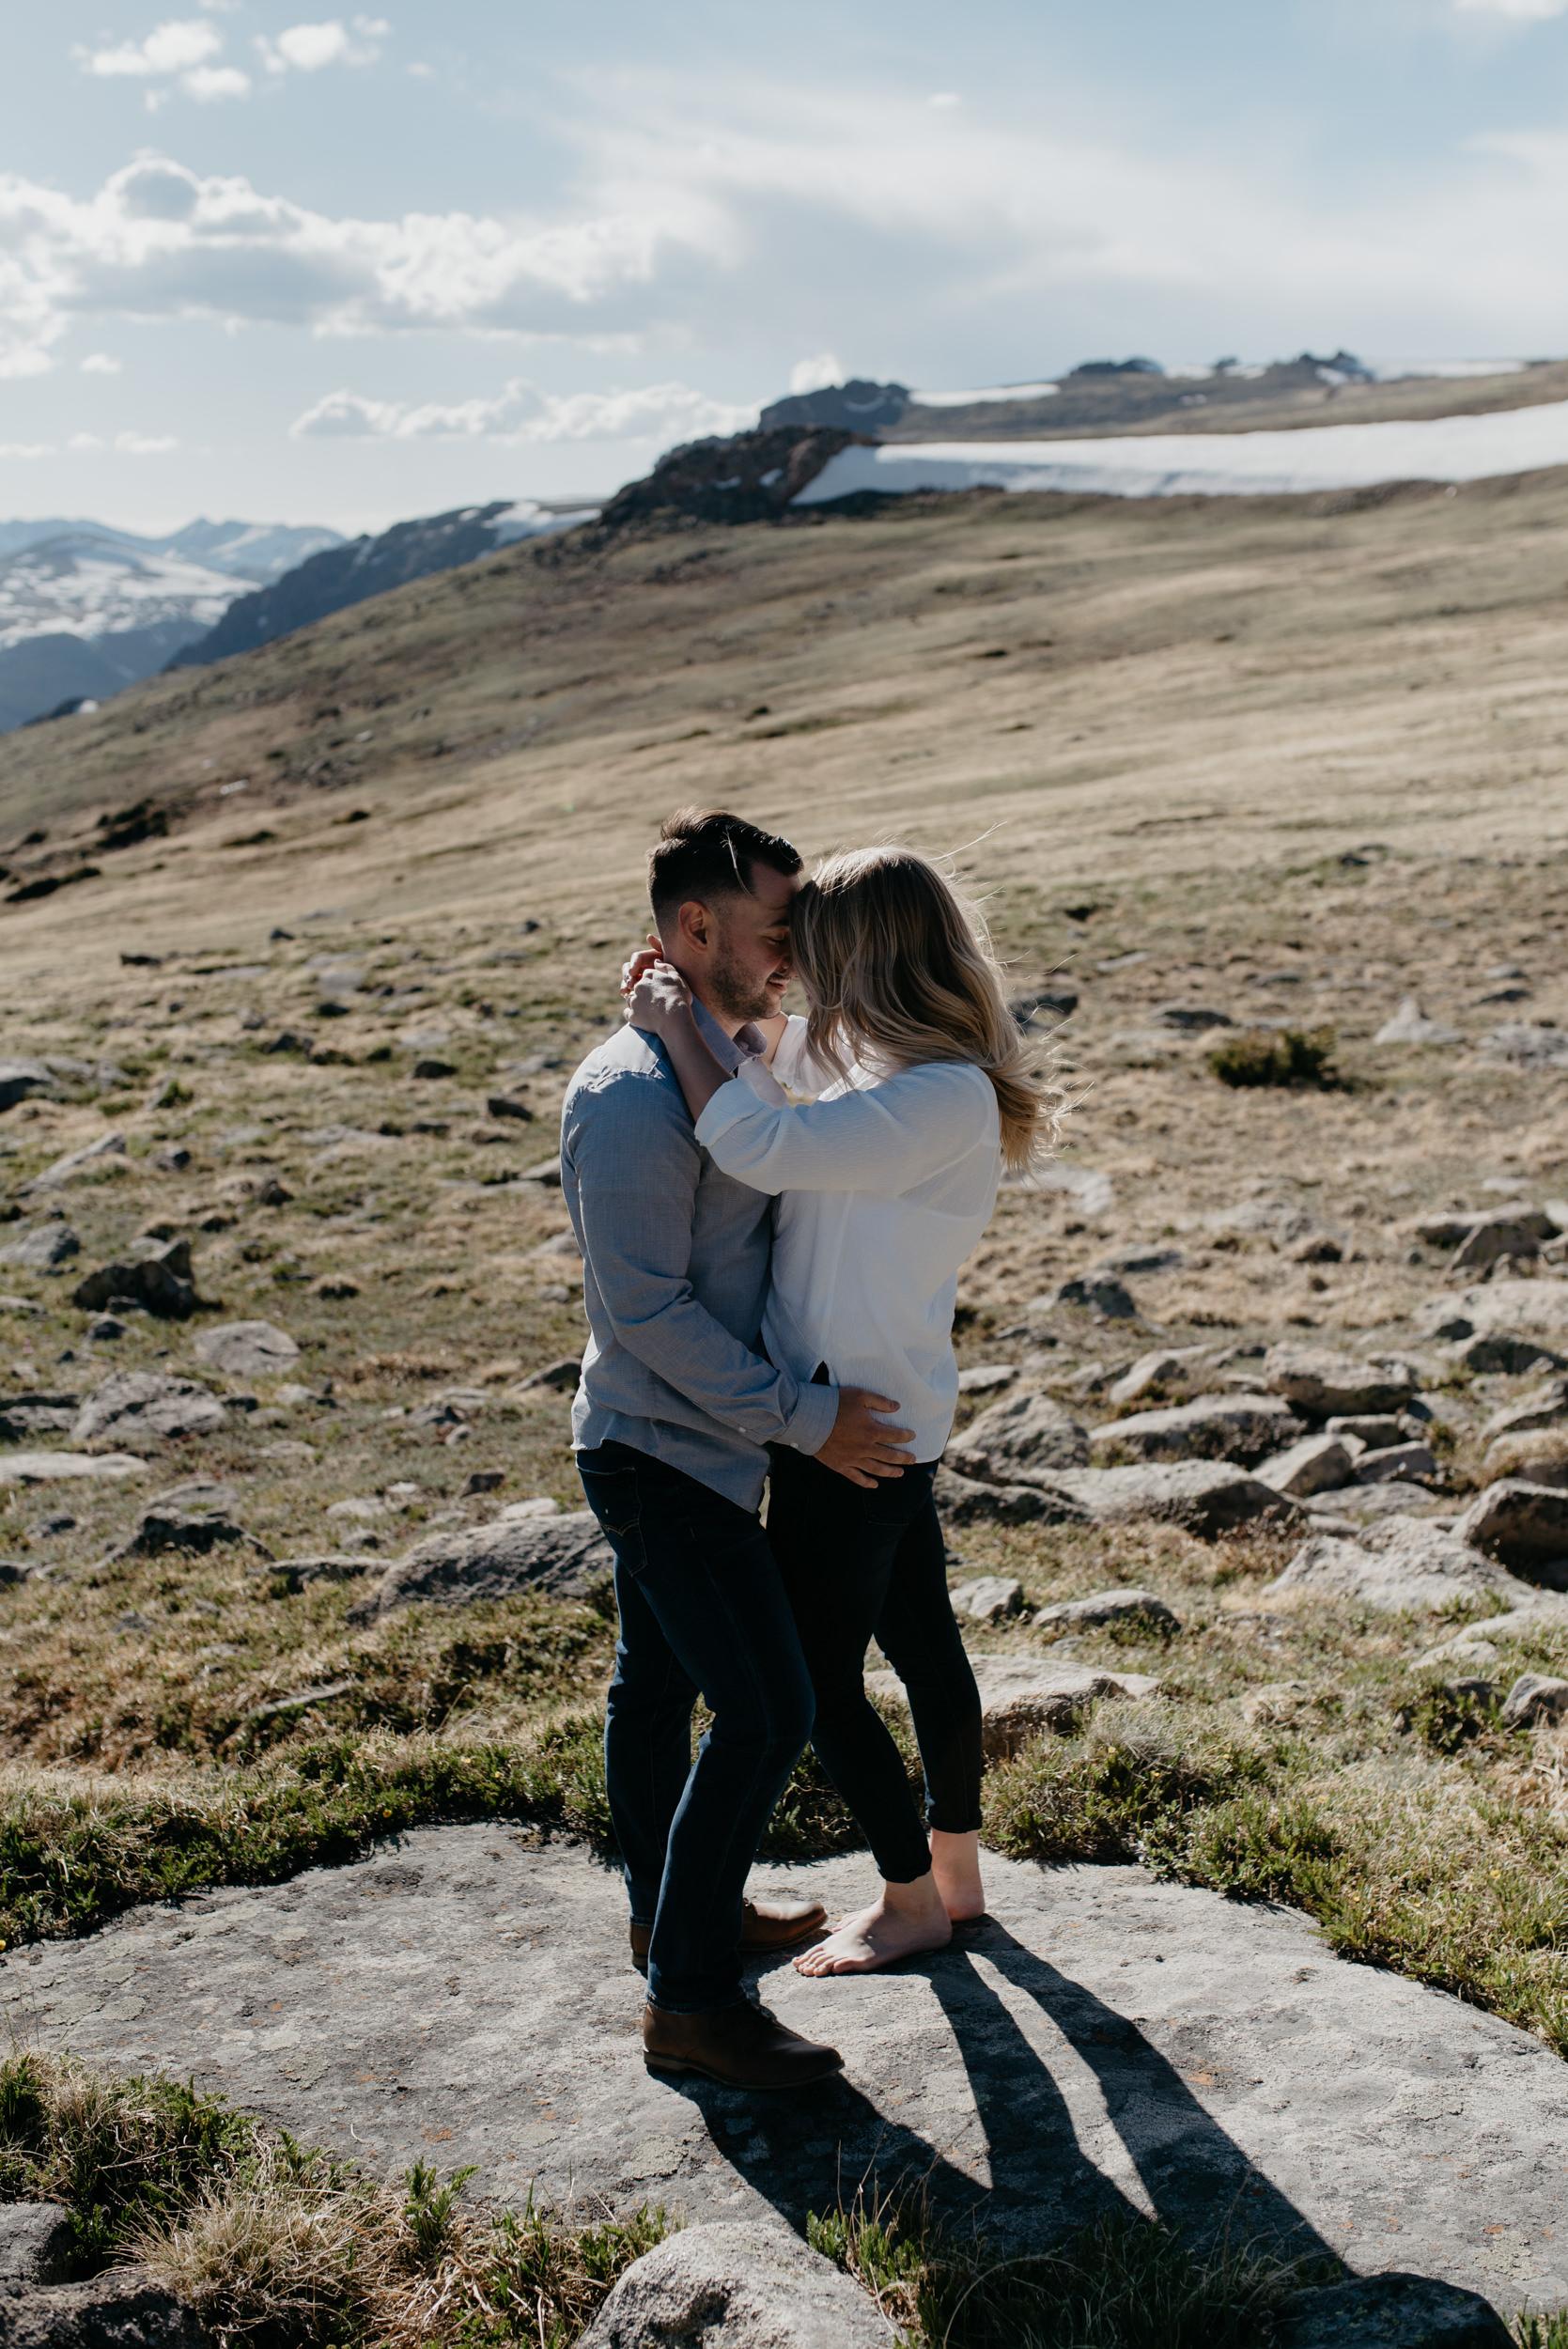 Adventure wedding photographer based in Colorado.